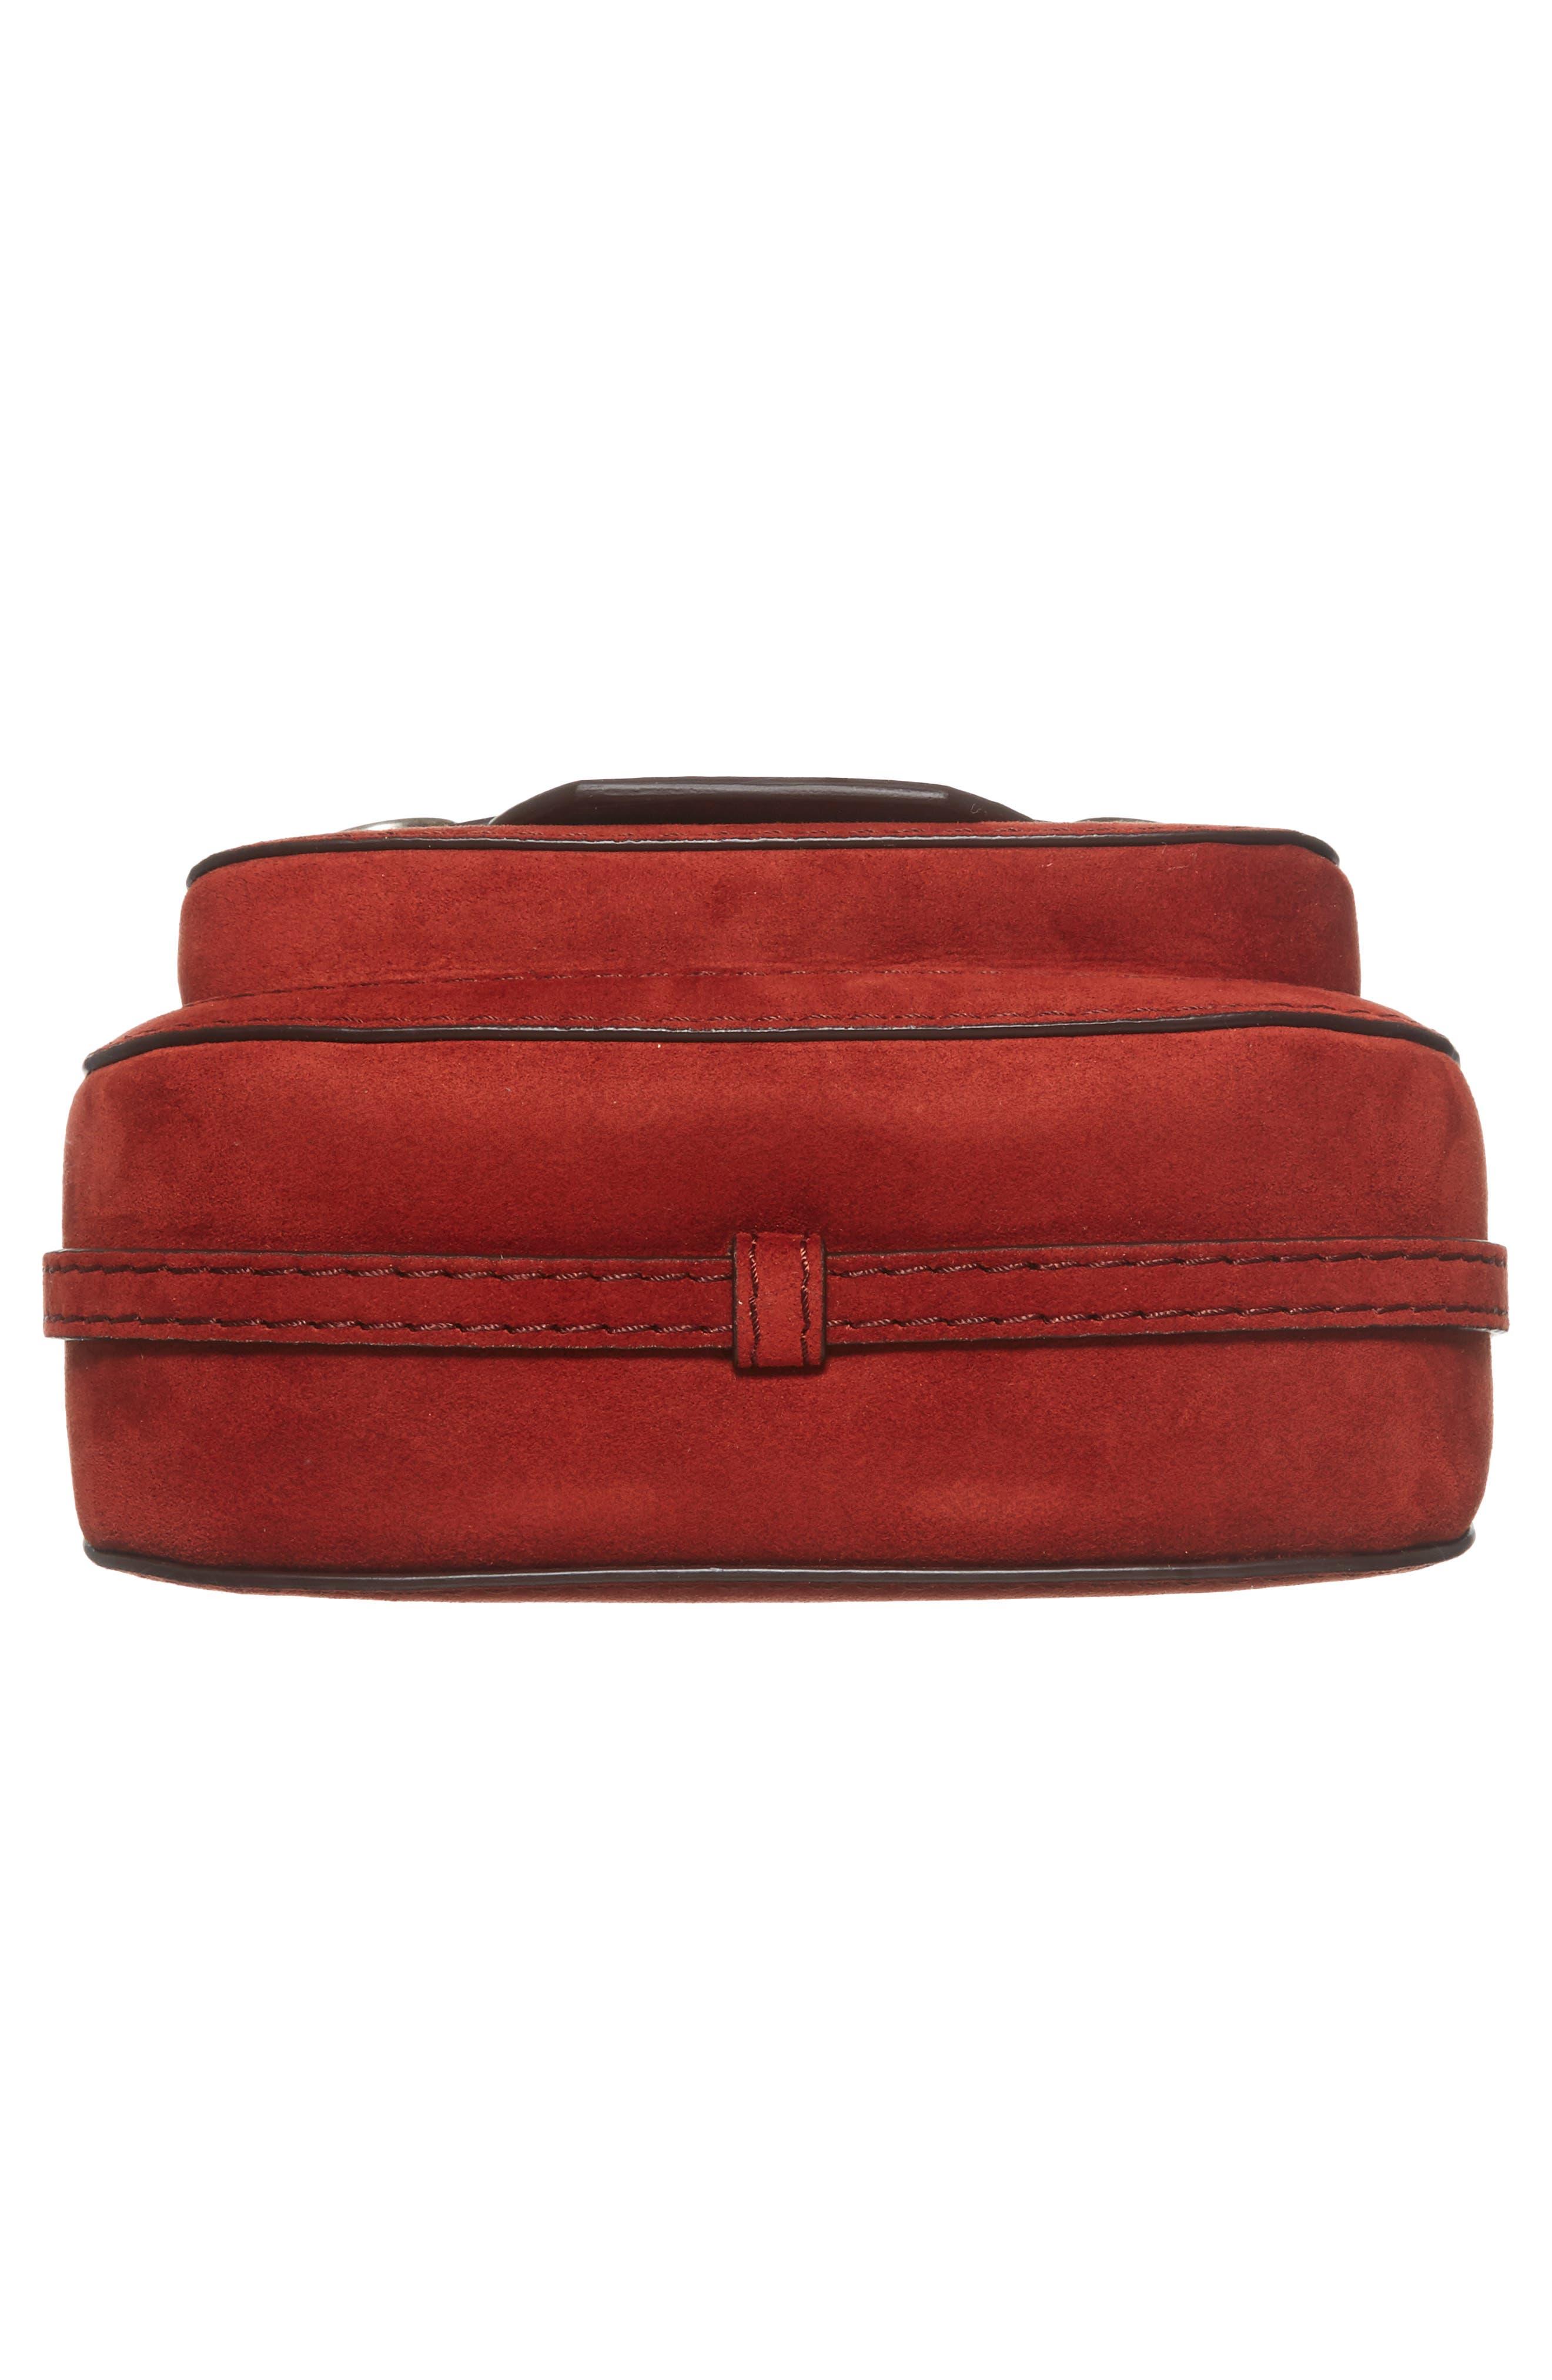 Faux Leather Shoulder Bag,                             Alternate thumbnail 6, color,                             617